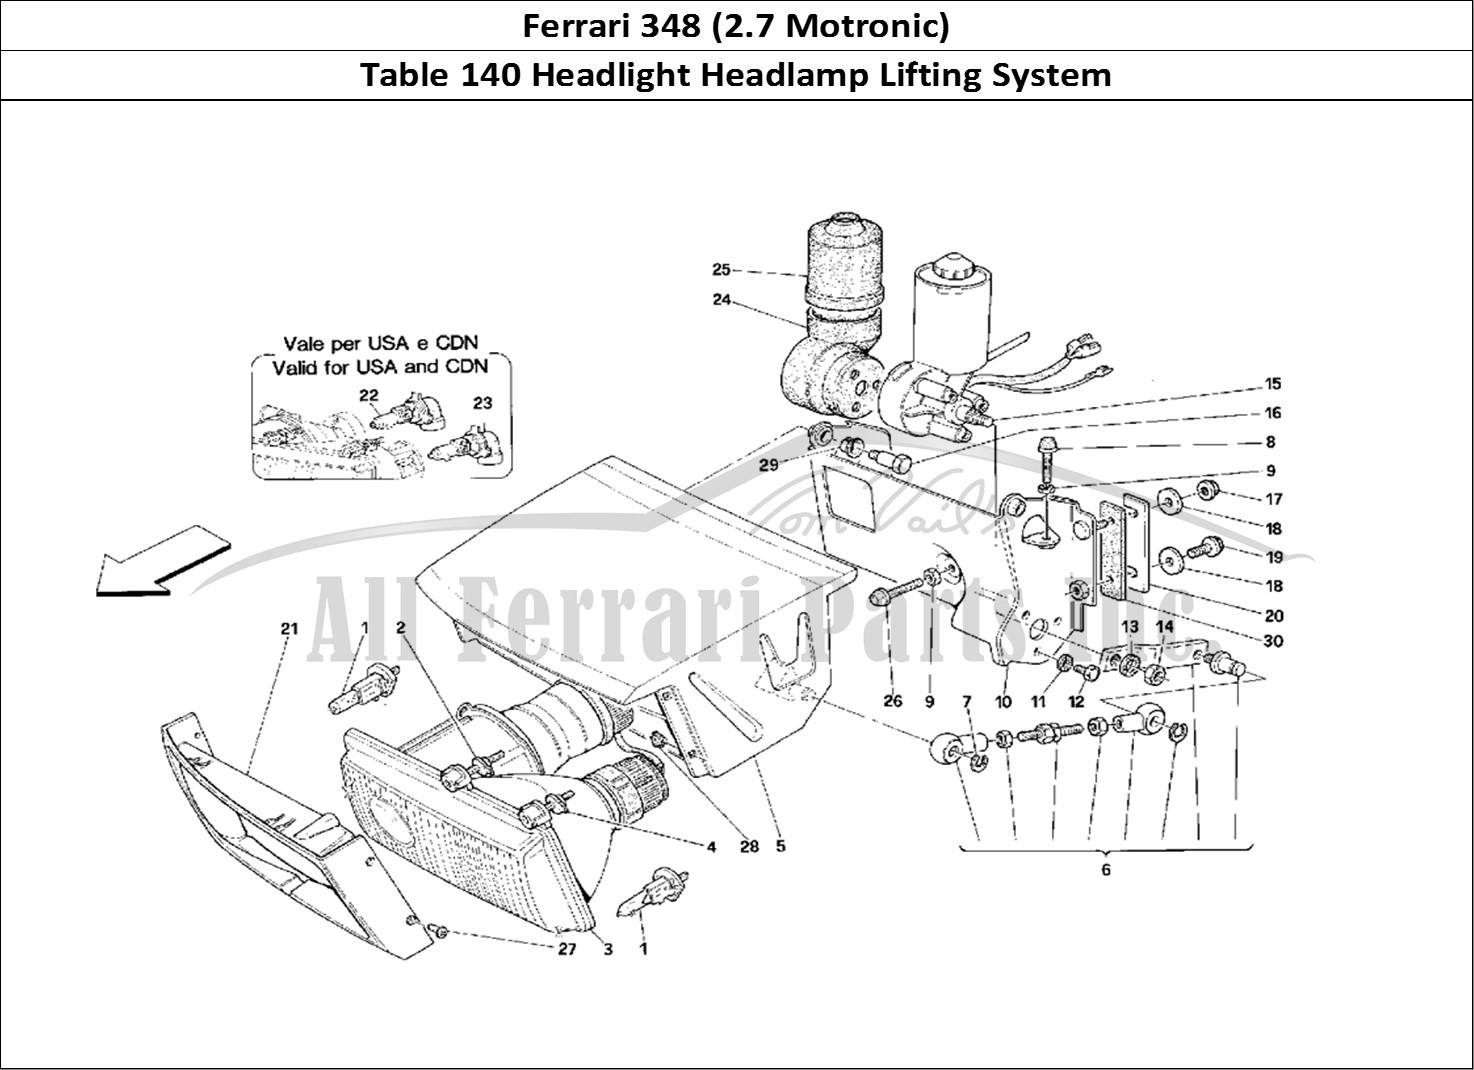 Buy Original Ferrari 348 2 7 Motronic 140 Headlight